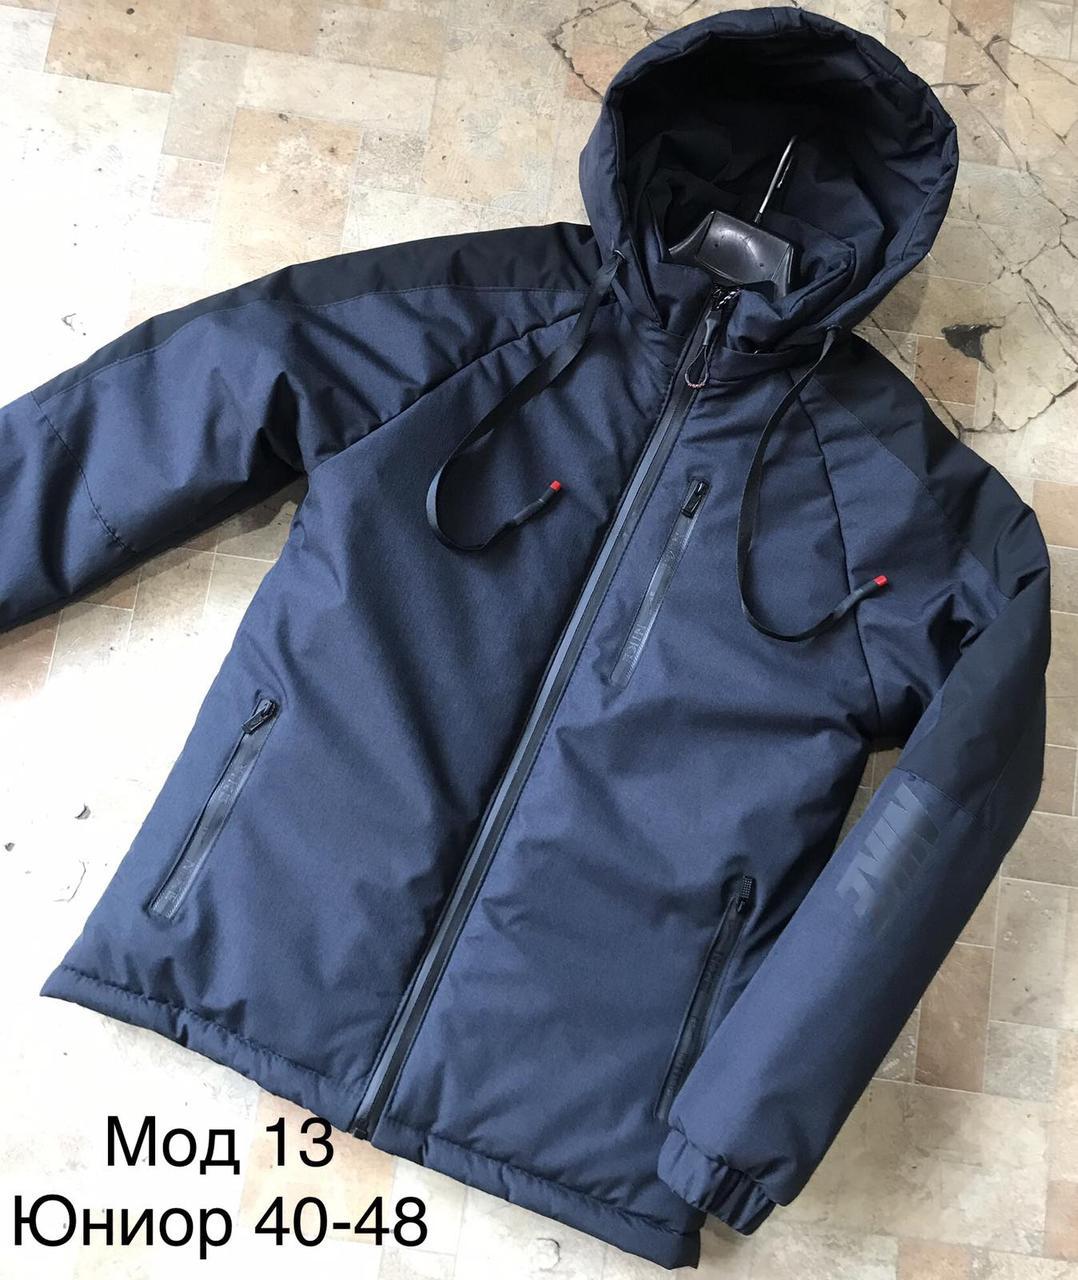 Подростковая осенняя куртка (юниор)